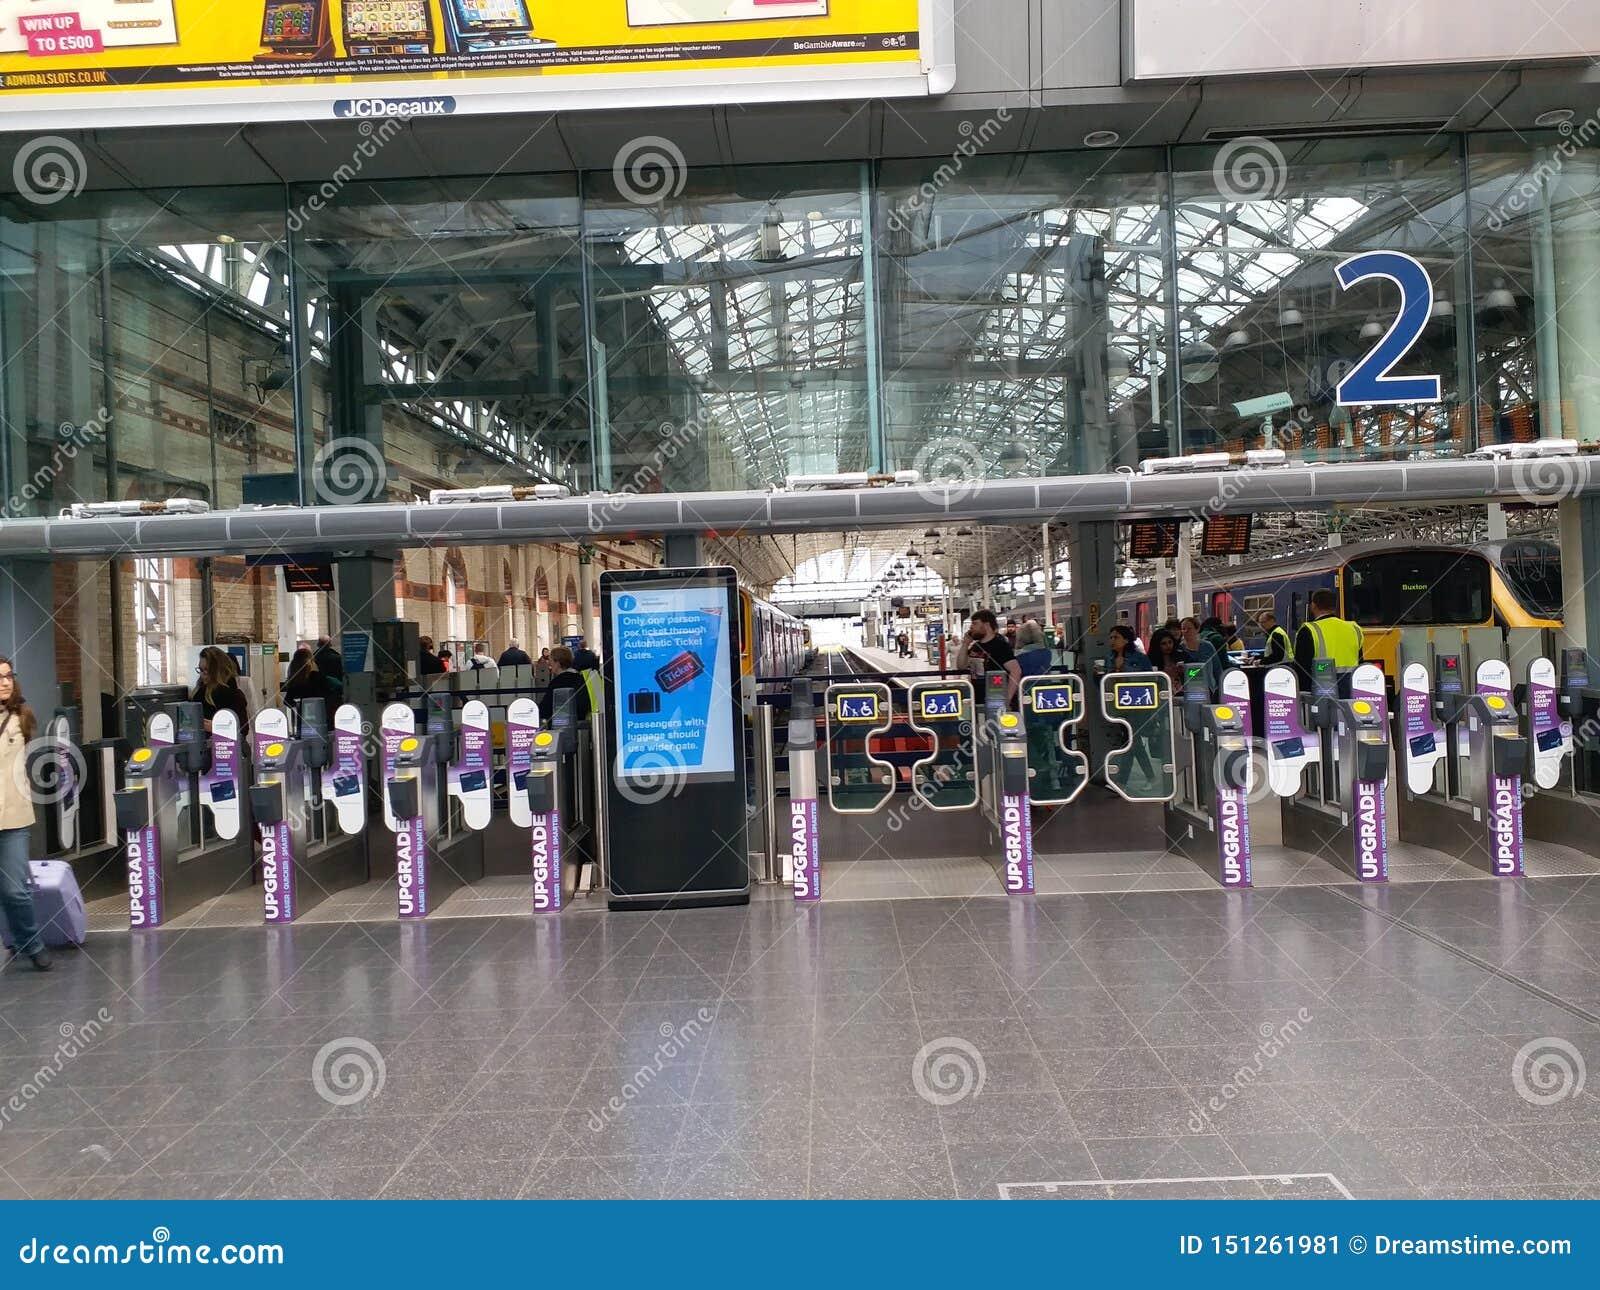 Вход платформы на станцию Piccadilly, Манчестер